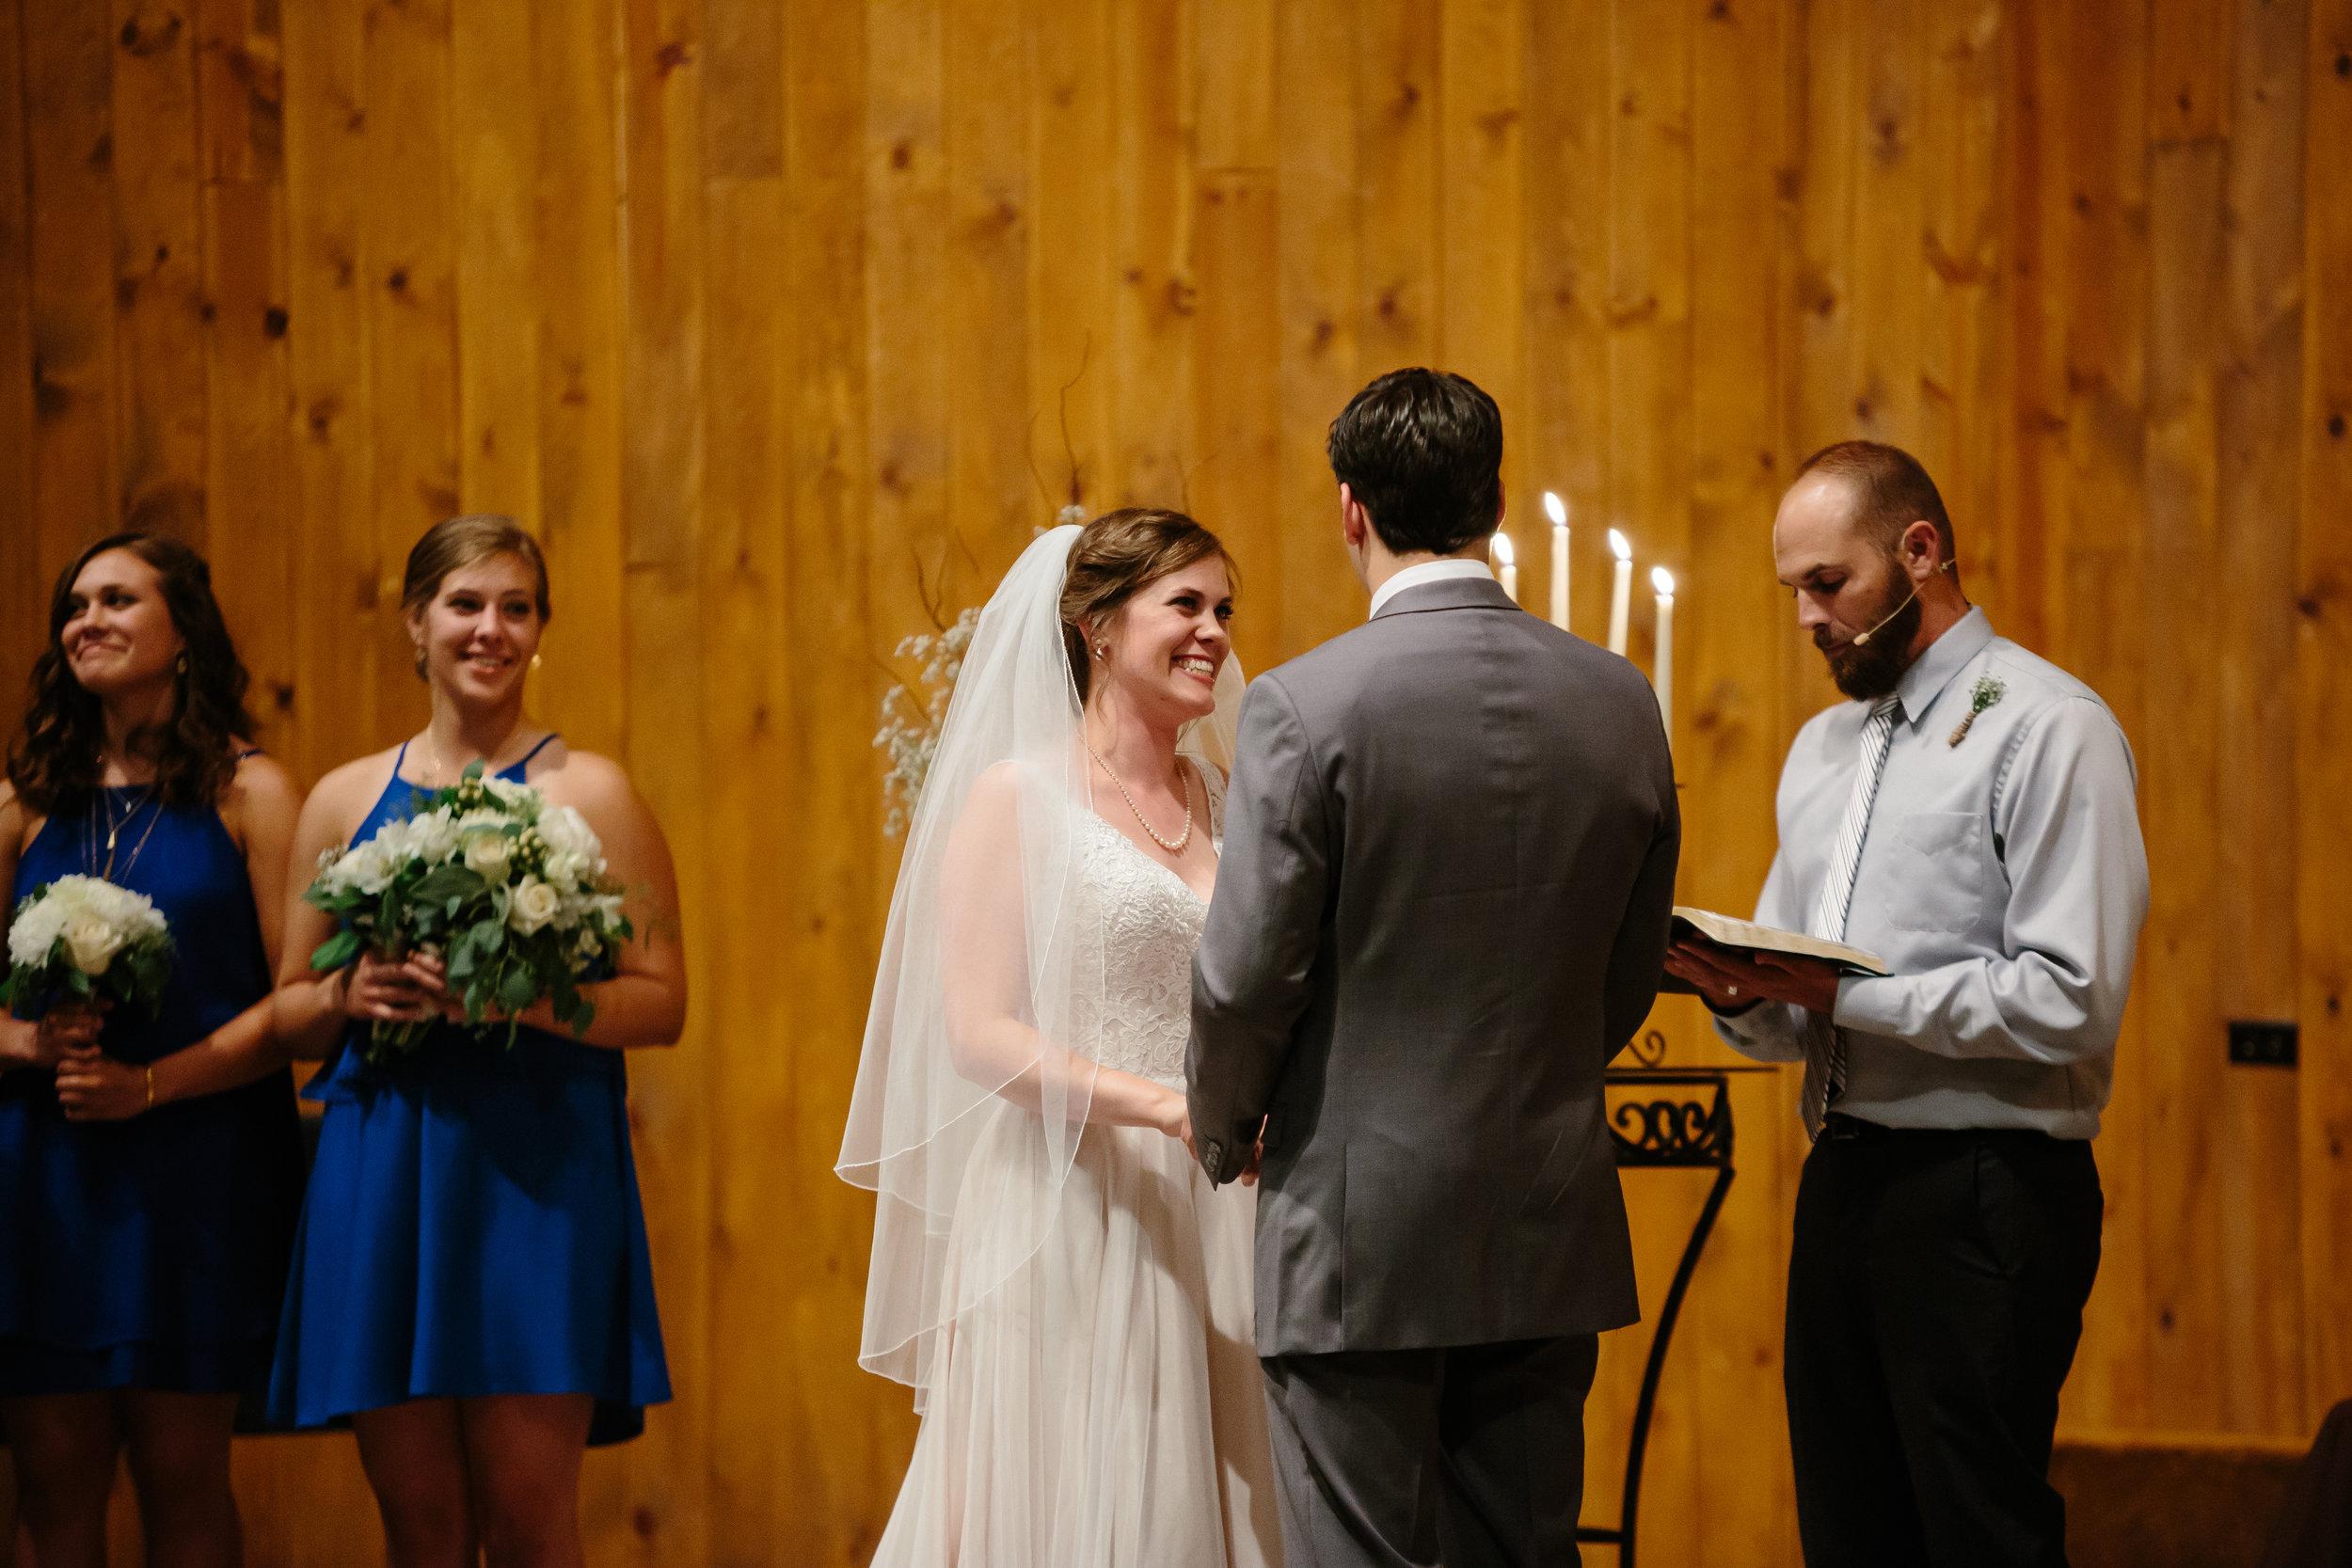 Jordan & Shantel Married - Idaho - Corrie Mick Photography-220.jpg